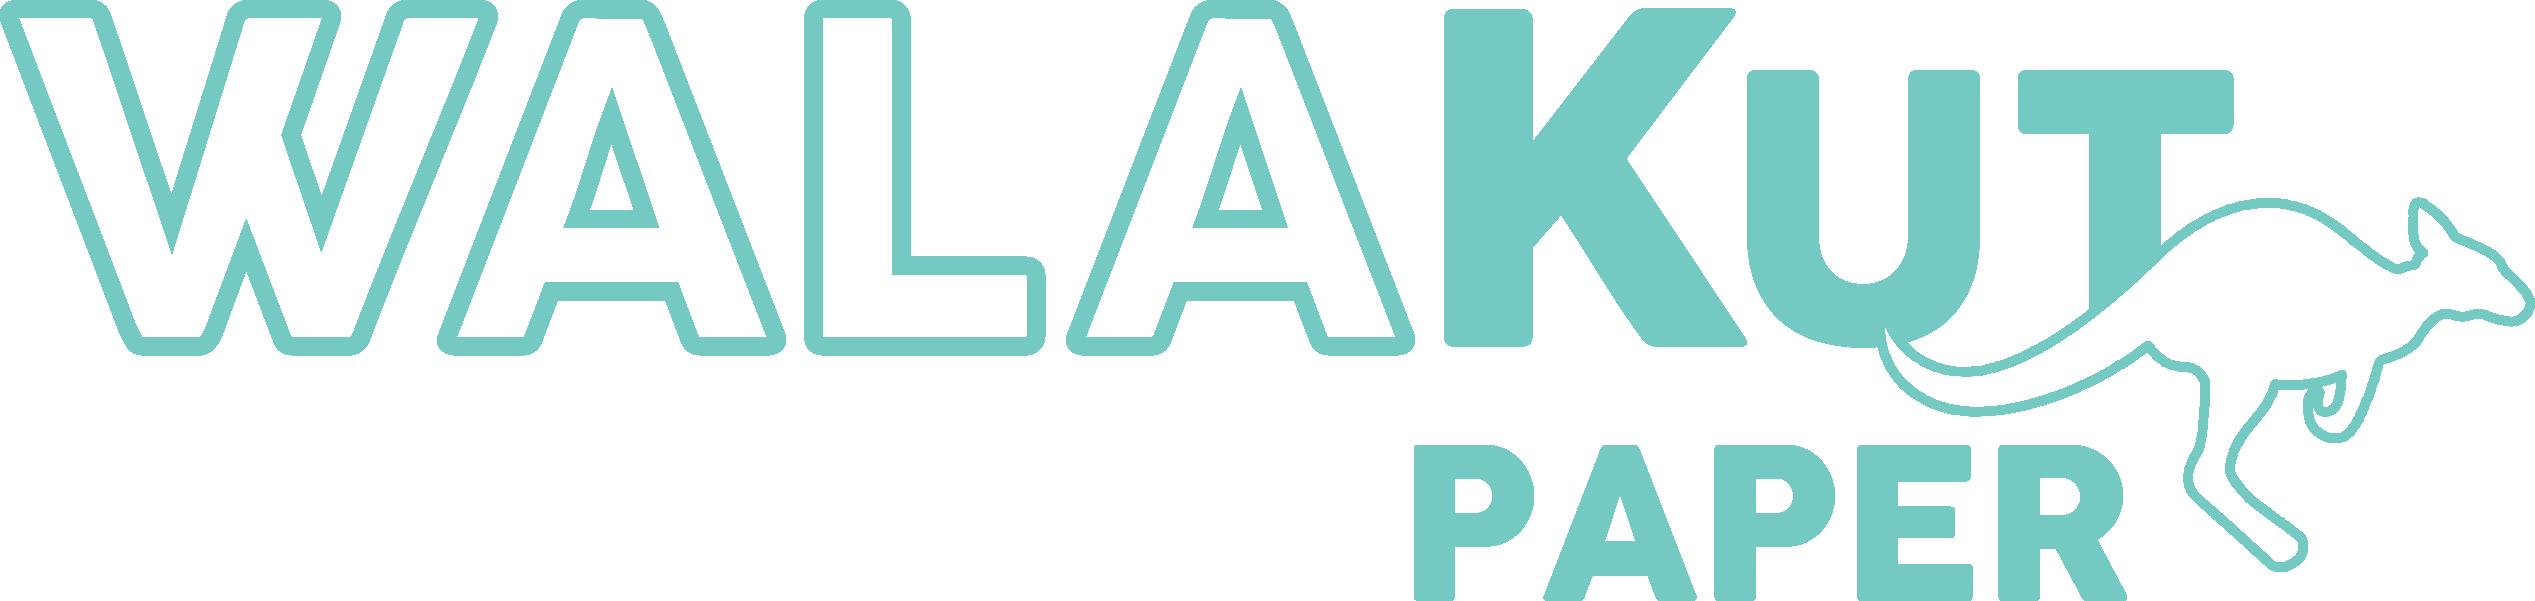 WALAKut Transfer Paper